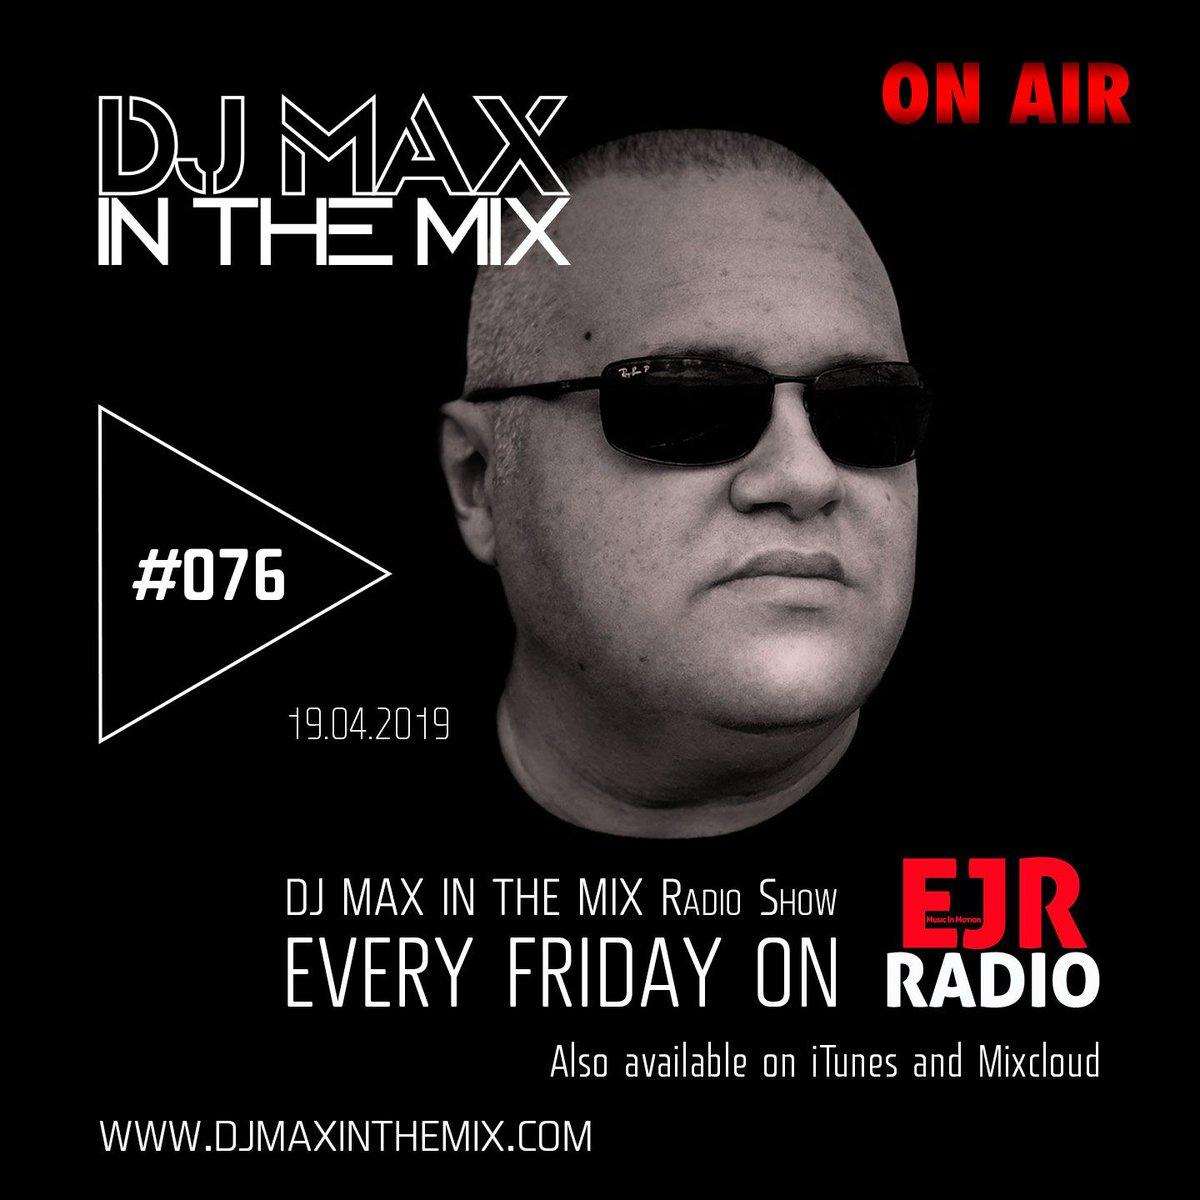 ON AIR | DJ MAX In The Mix #radioshow #076 on @ejrradio | 11 pm to 12 am CEST #djmax #housemusic #electronicmusic #house #techhouse #clubbing #djlife #dj #radio #producer #amsterdam #ibiza #croatia #italy #uk #usa  Live stream: https://buff.ly/2Ep2d3s